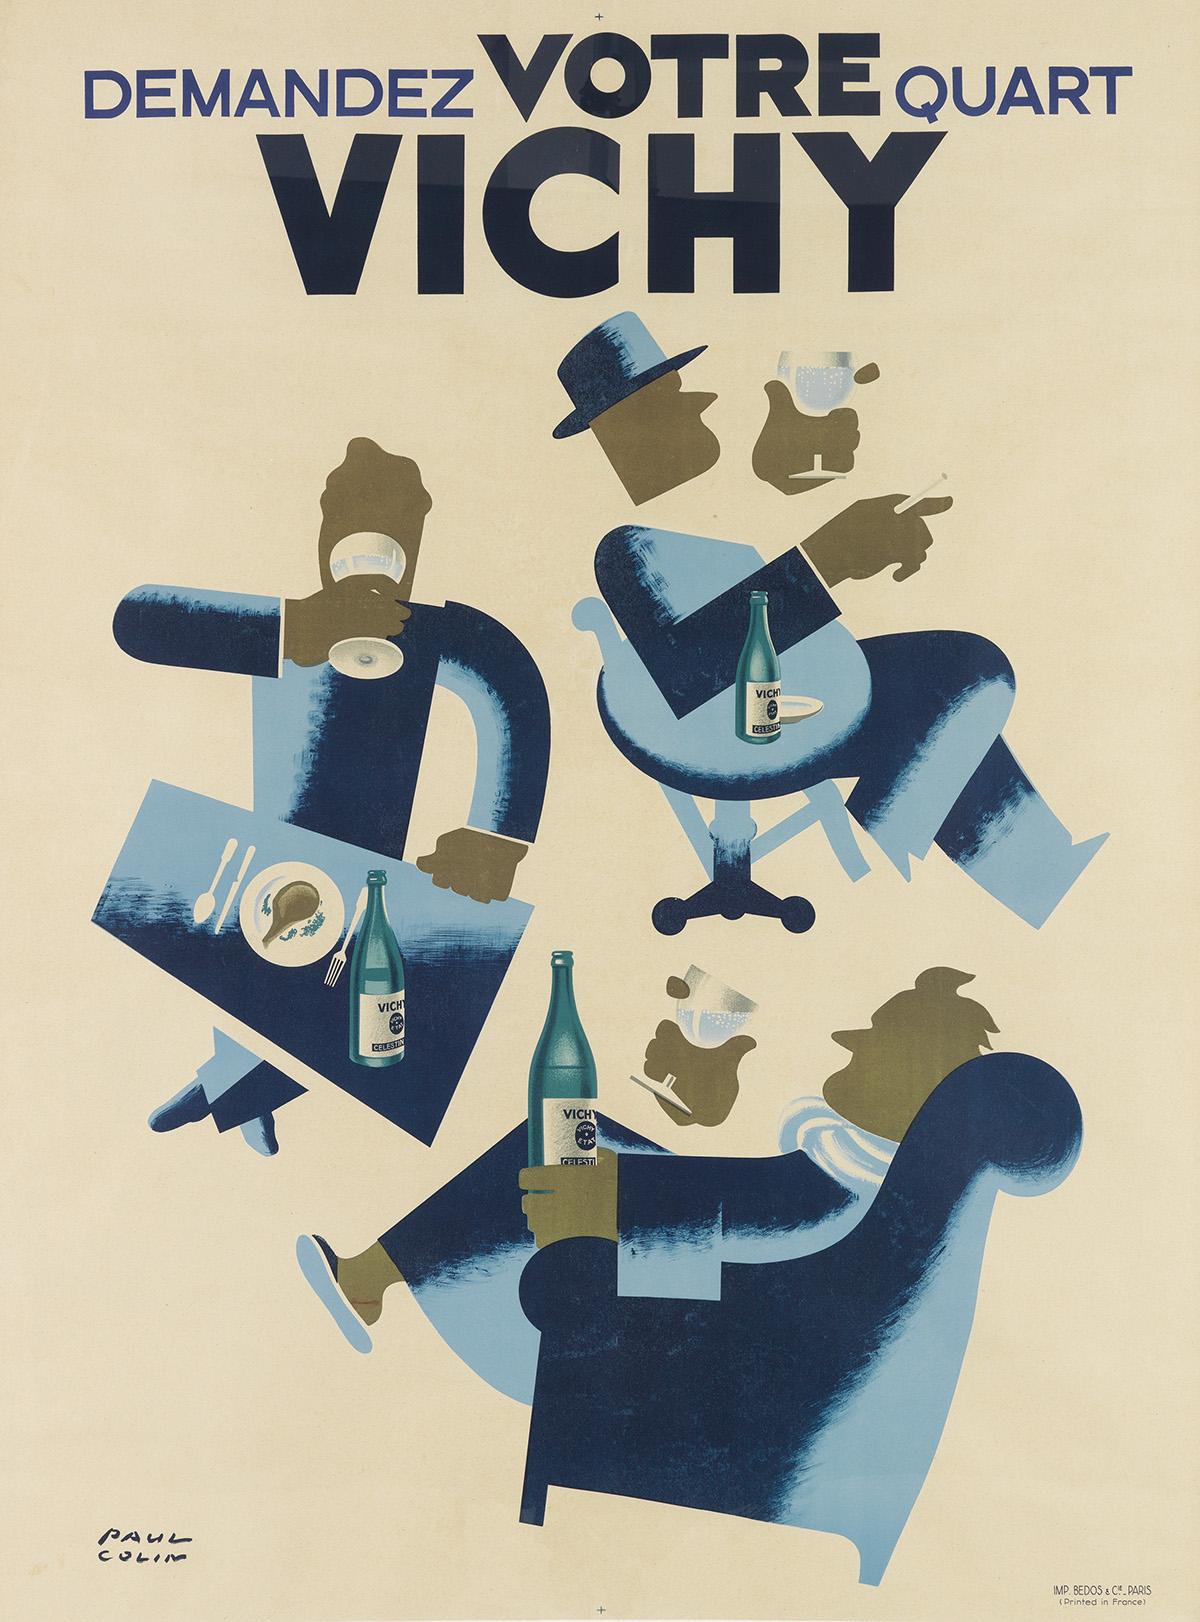 PAUL-COLIN-(1892-1986)-VICHY--DEMANDEZ-VOTRE-QUART-1948-65x4